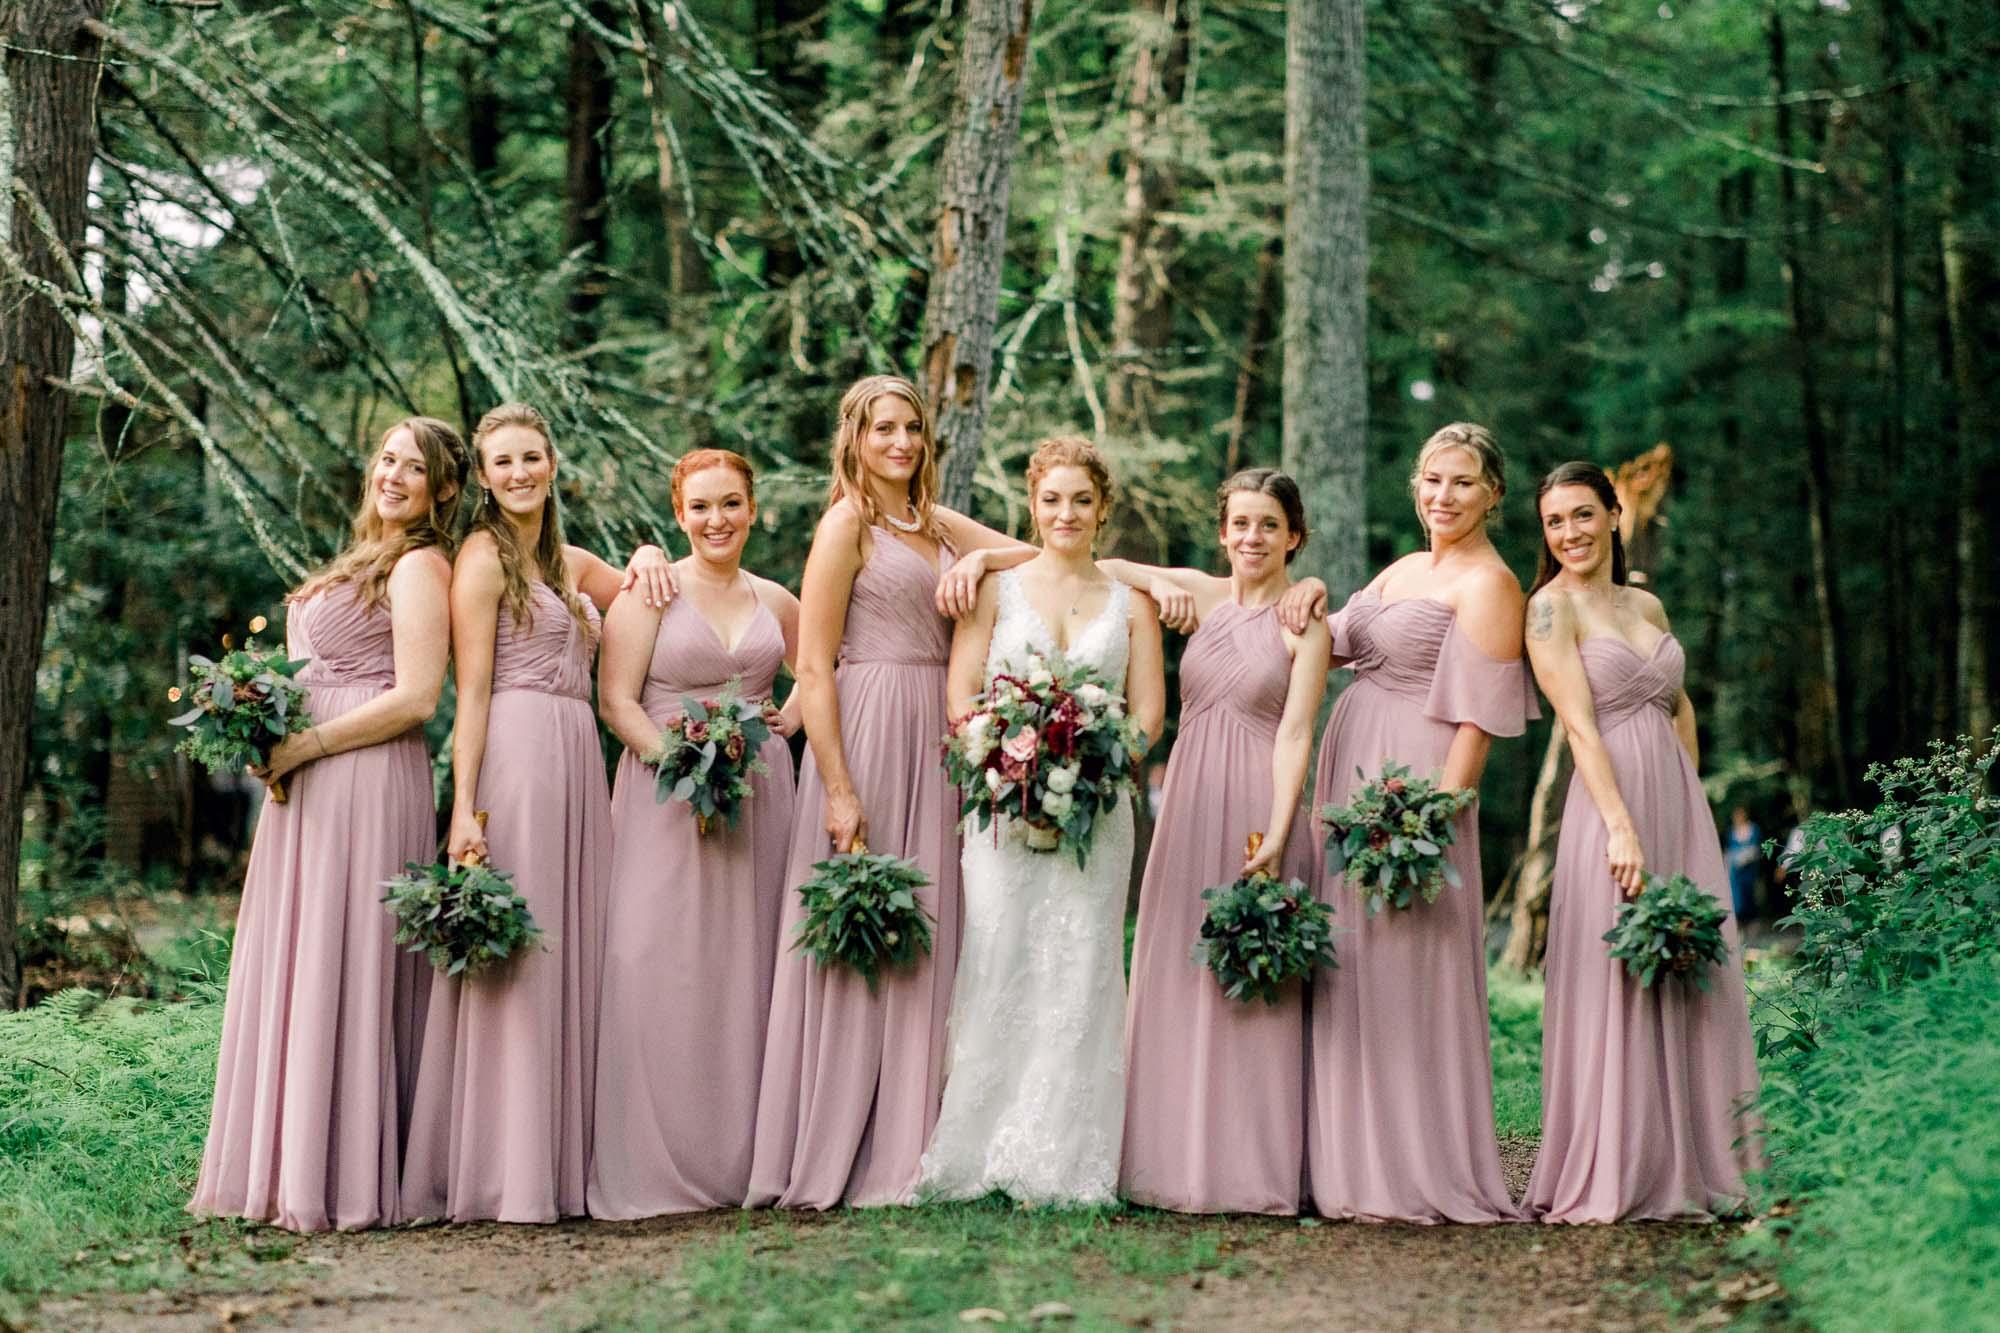 lacawac-sanctuary-wedding-lake-wallenpaupack-9332.jpg